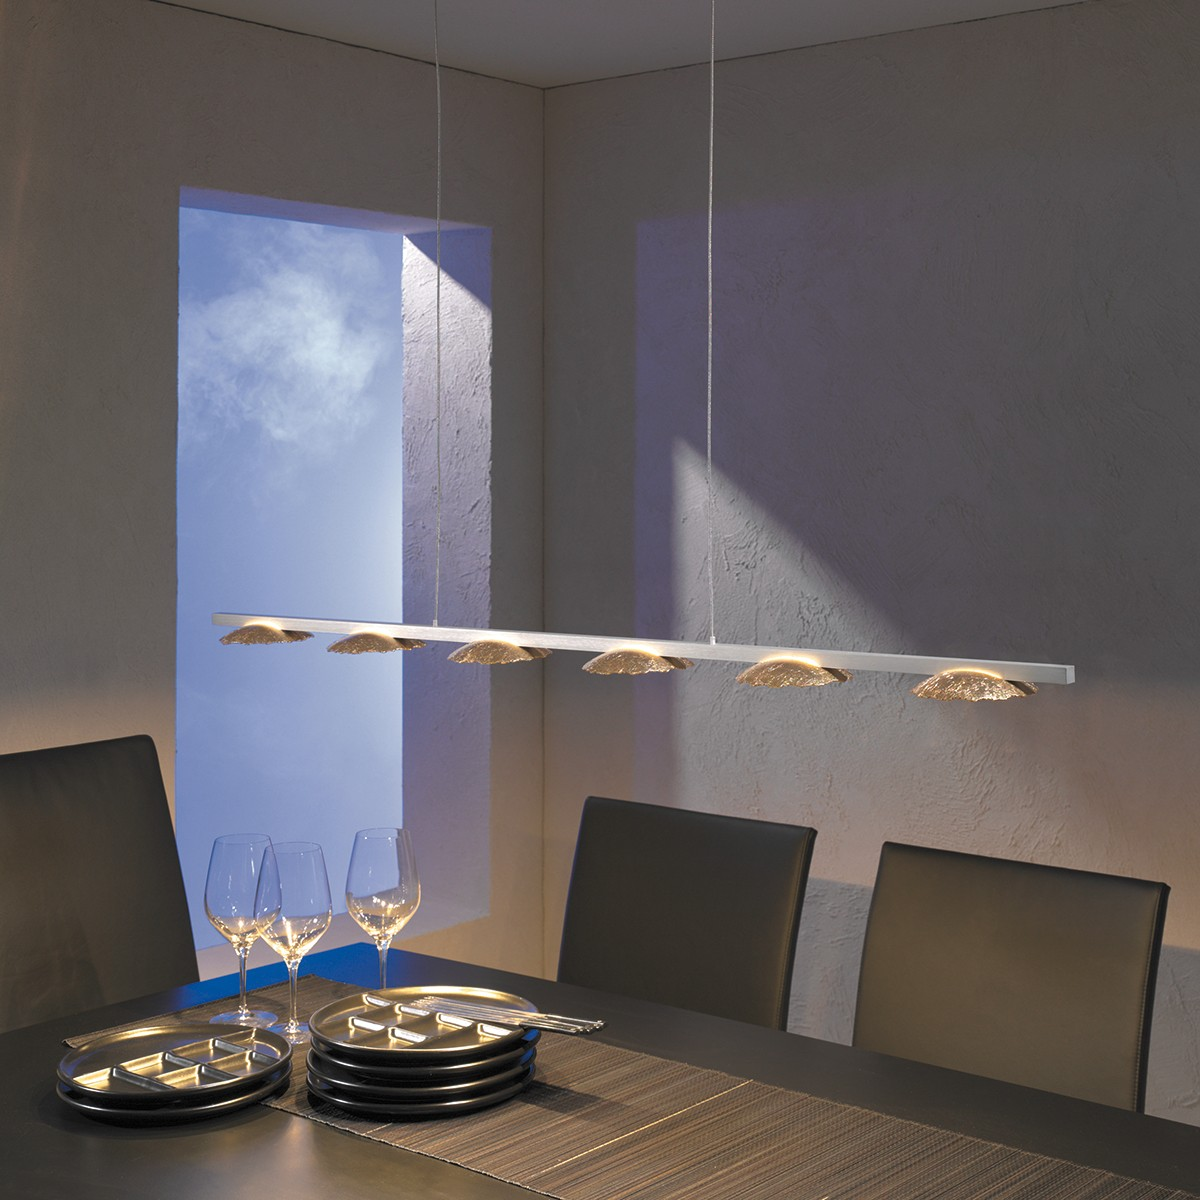 Escale Medusa LED Pendelleuchte, Blattgold, mit Casambi-Modul